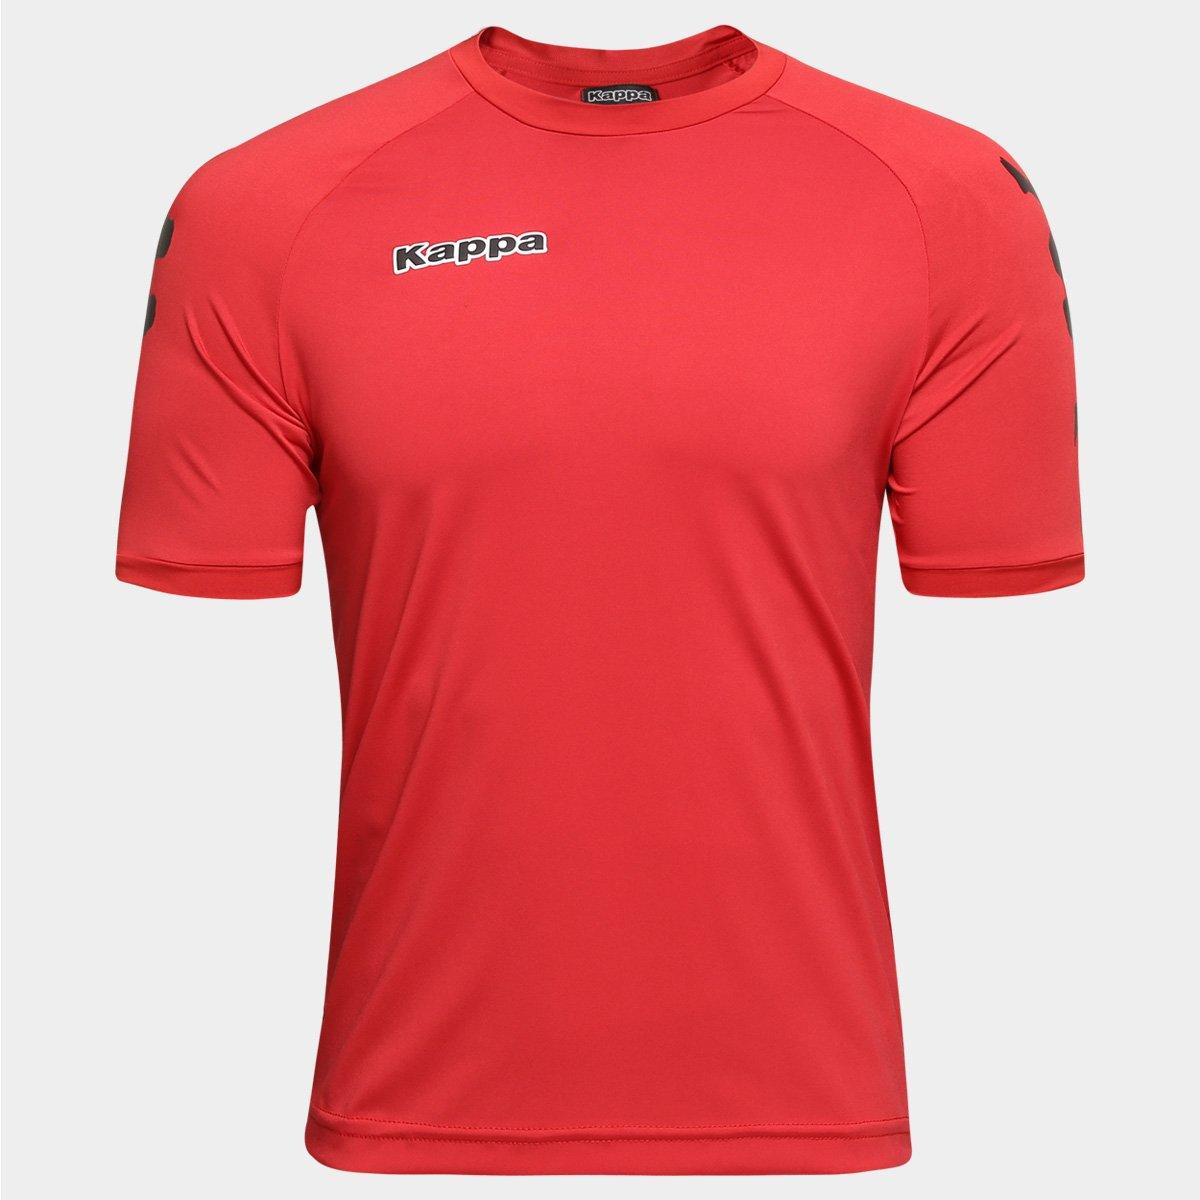 b275a8ca50d25 Camisa Kappa Kombat Lettering Masculina - Compre Agora